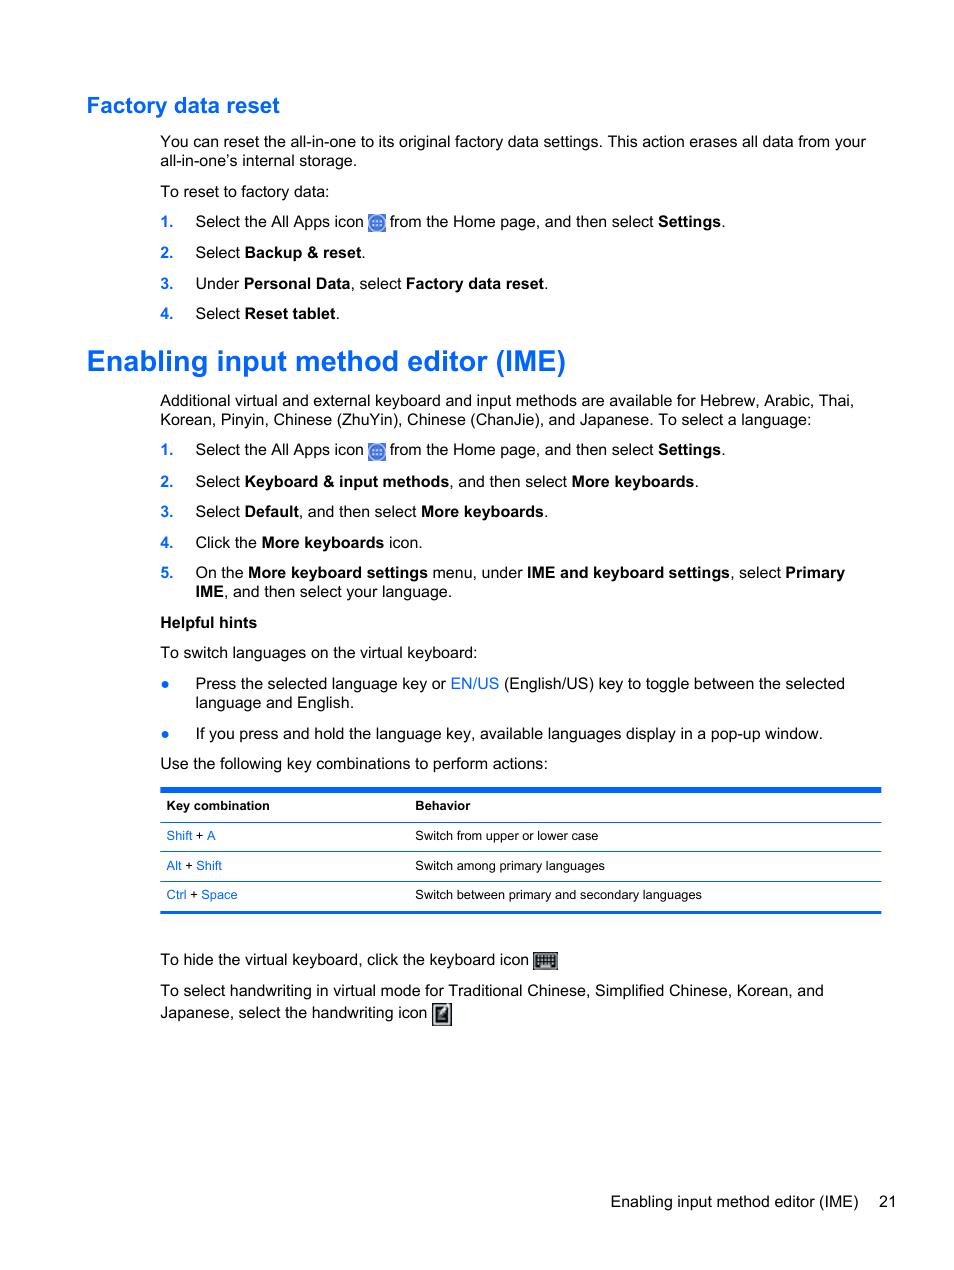 Factory data reset, Enabling input method editor (ime)   HP Slate 21